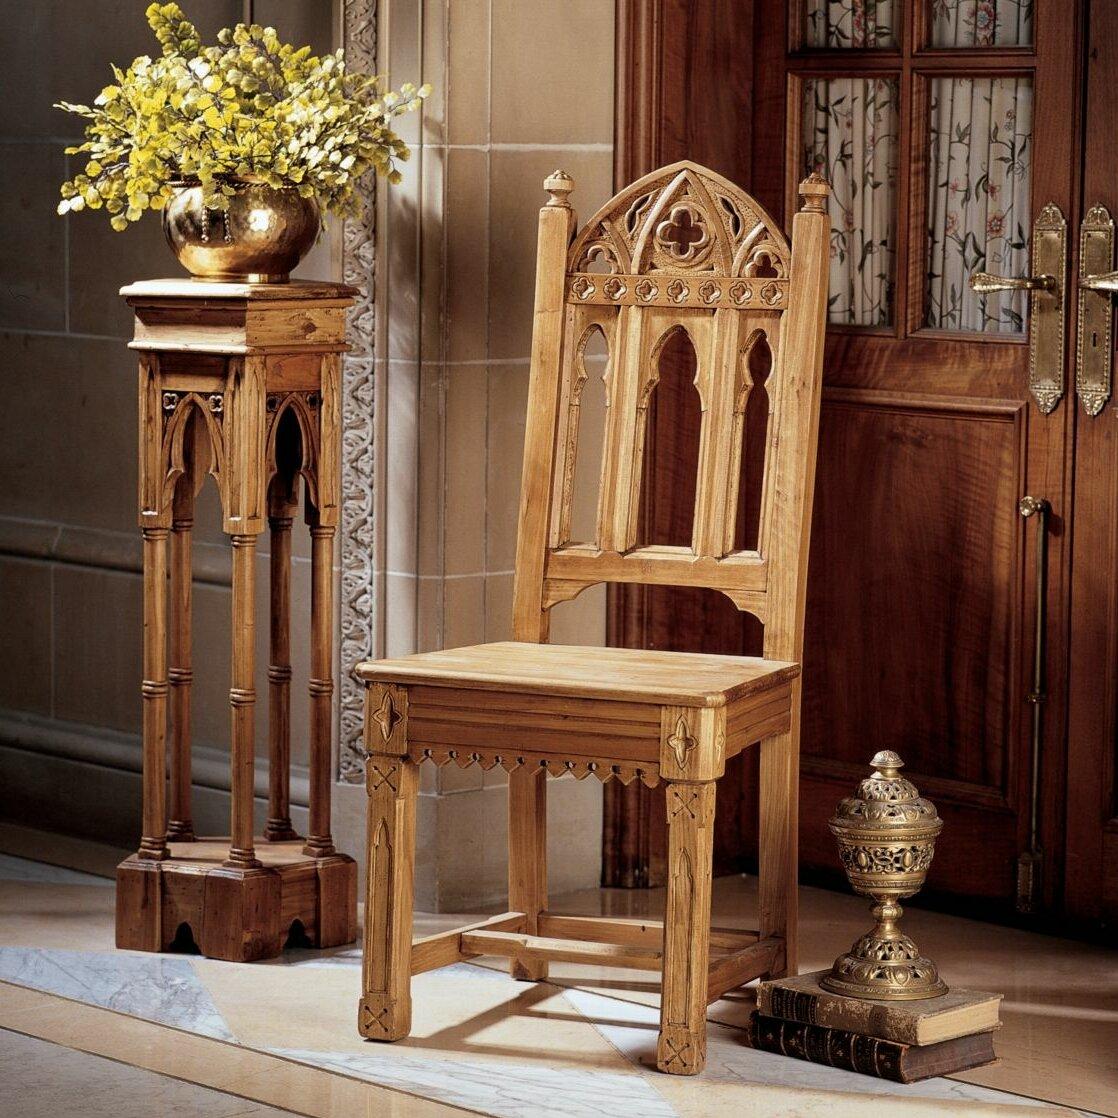 Gothic furniture chair - Design Toscano Sudbury Gothic Side Chair